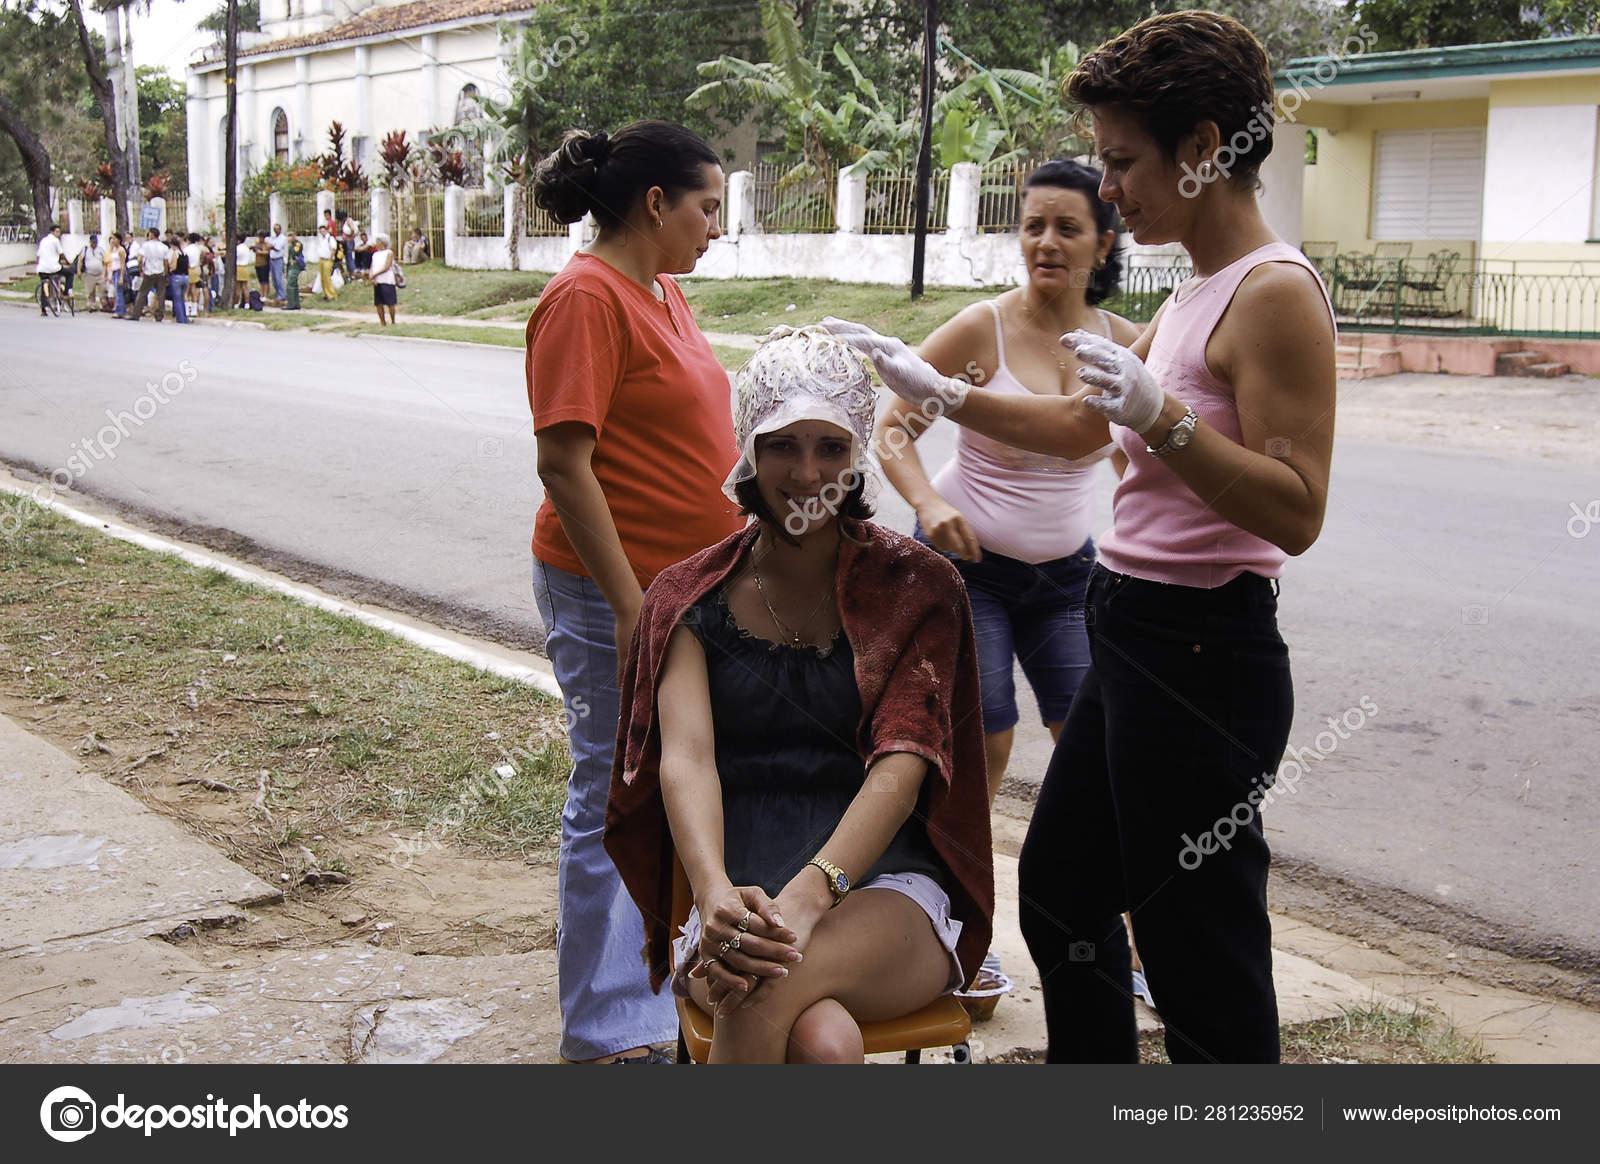 Anal Girl Pinar del Rio